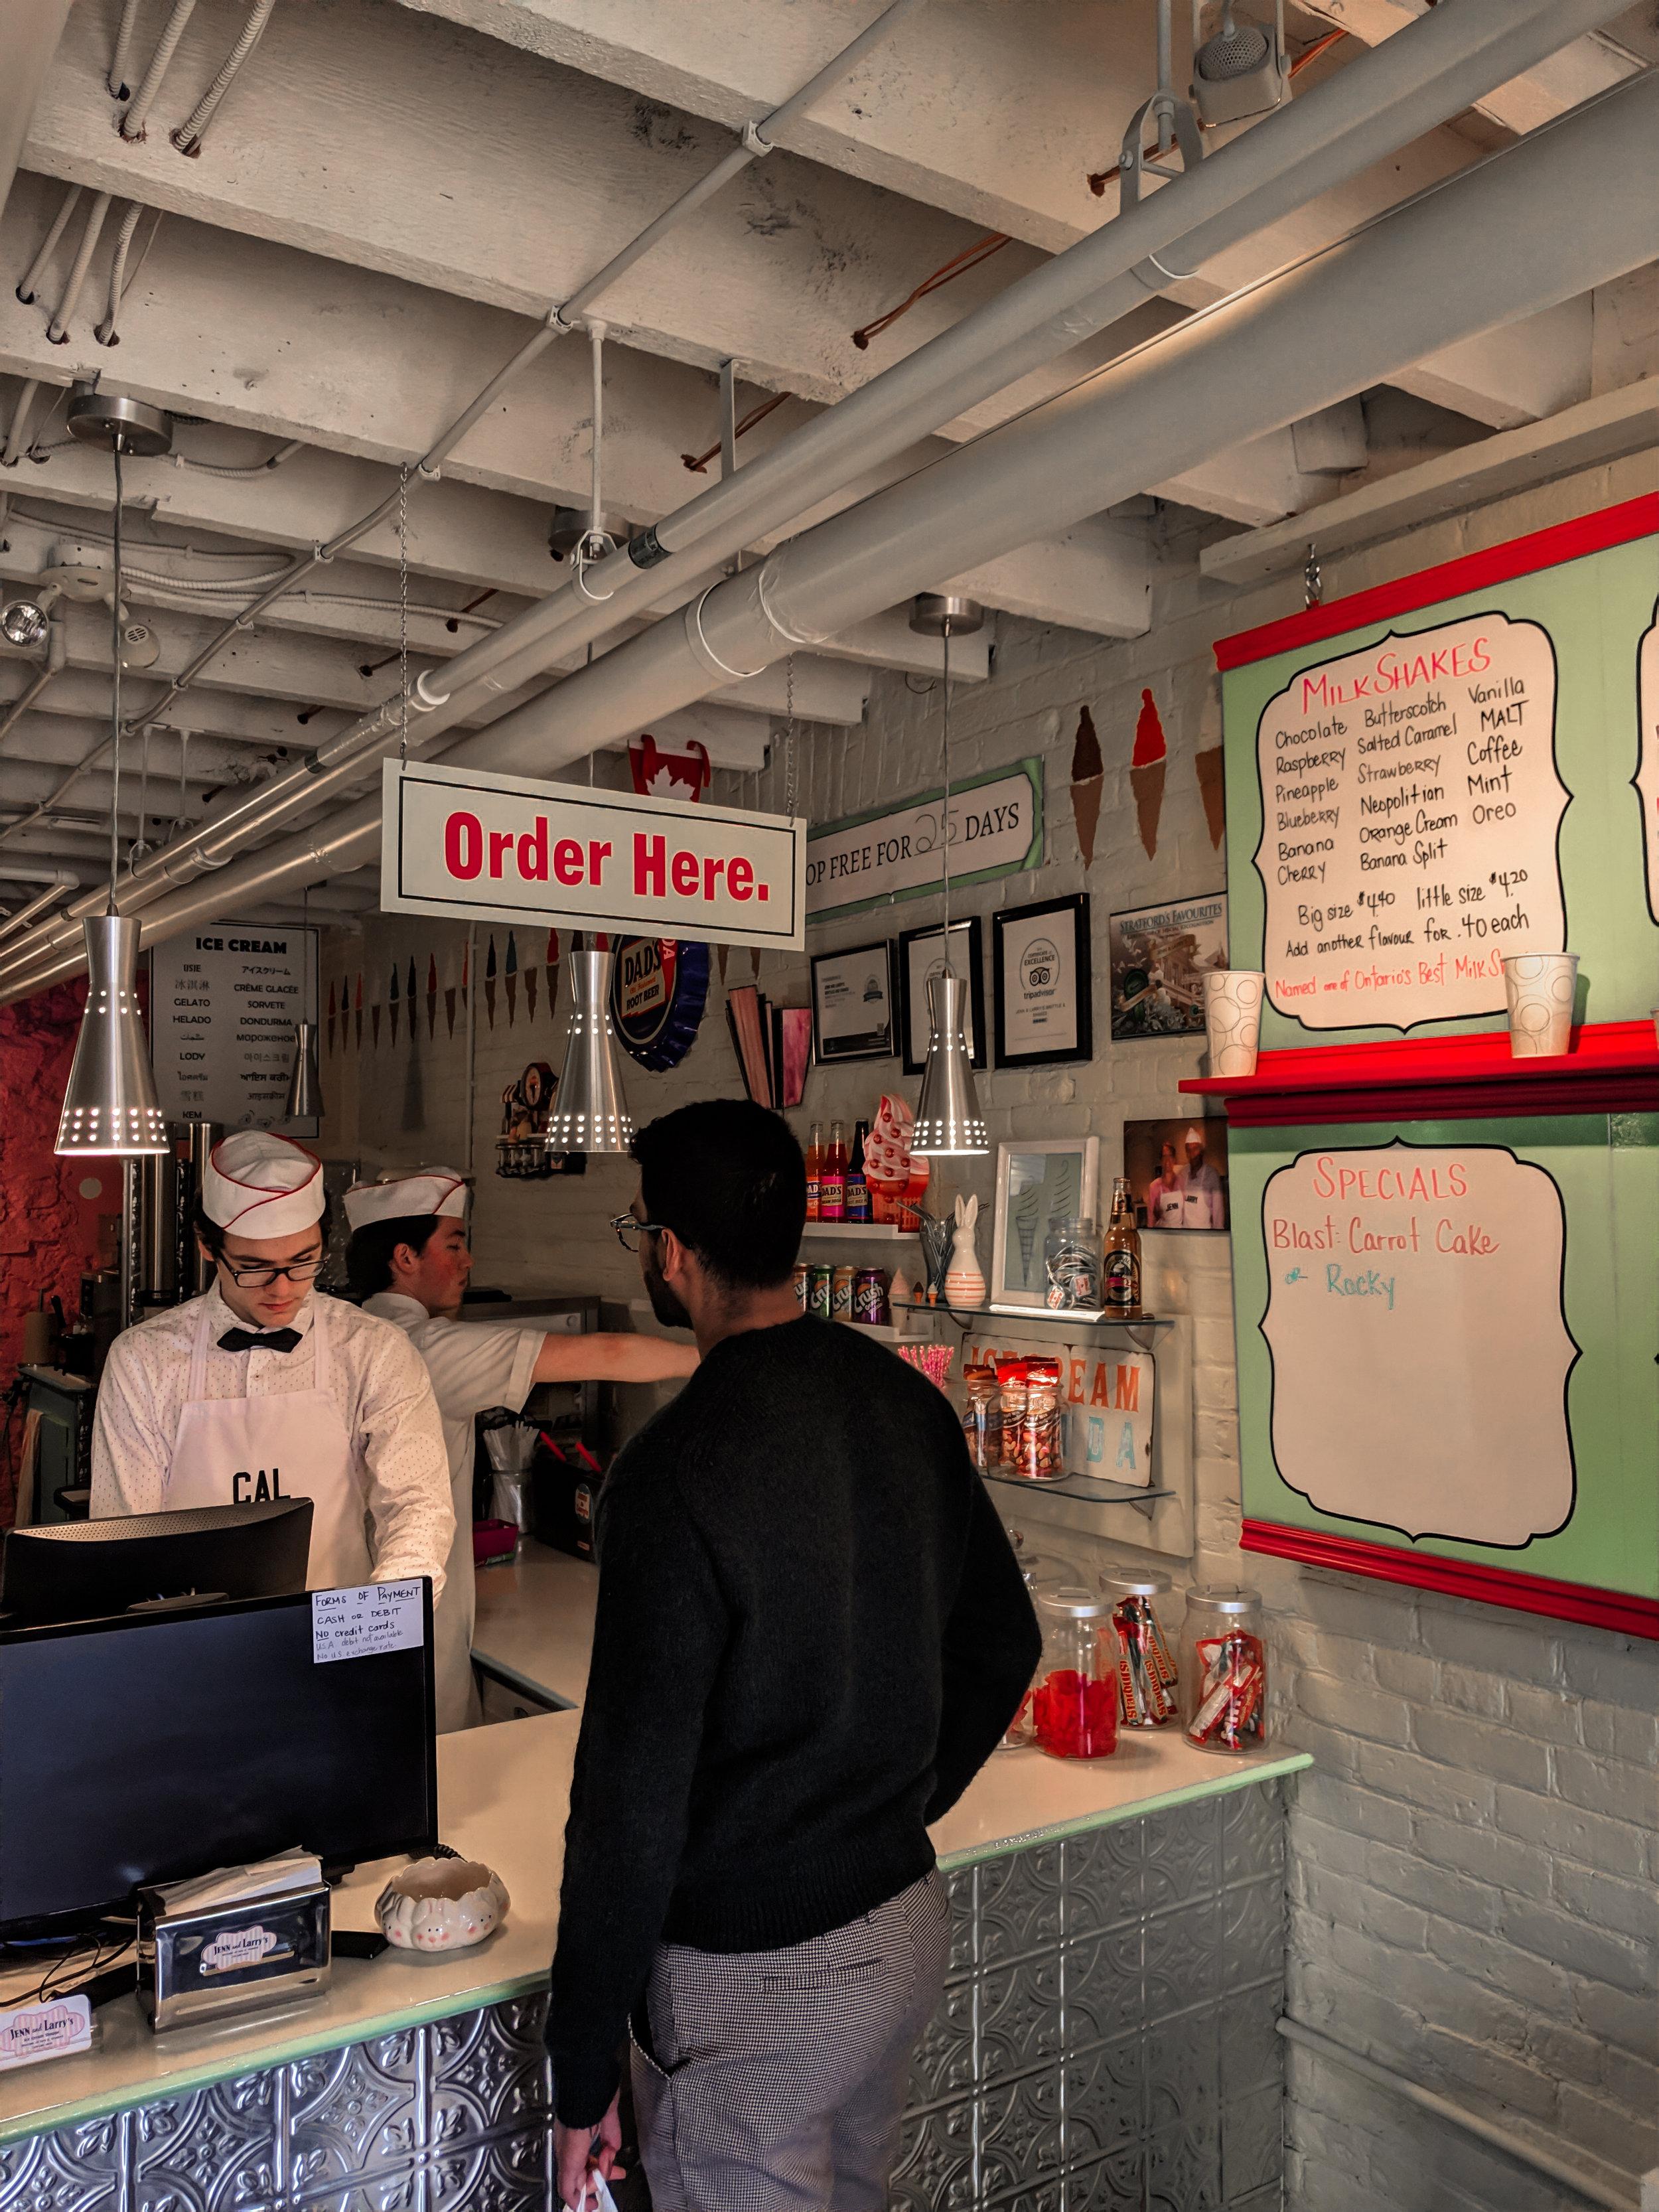 Jenn & Larry's Ice Cream Shoppe